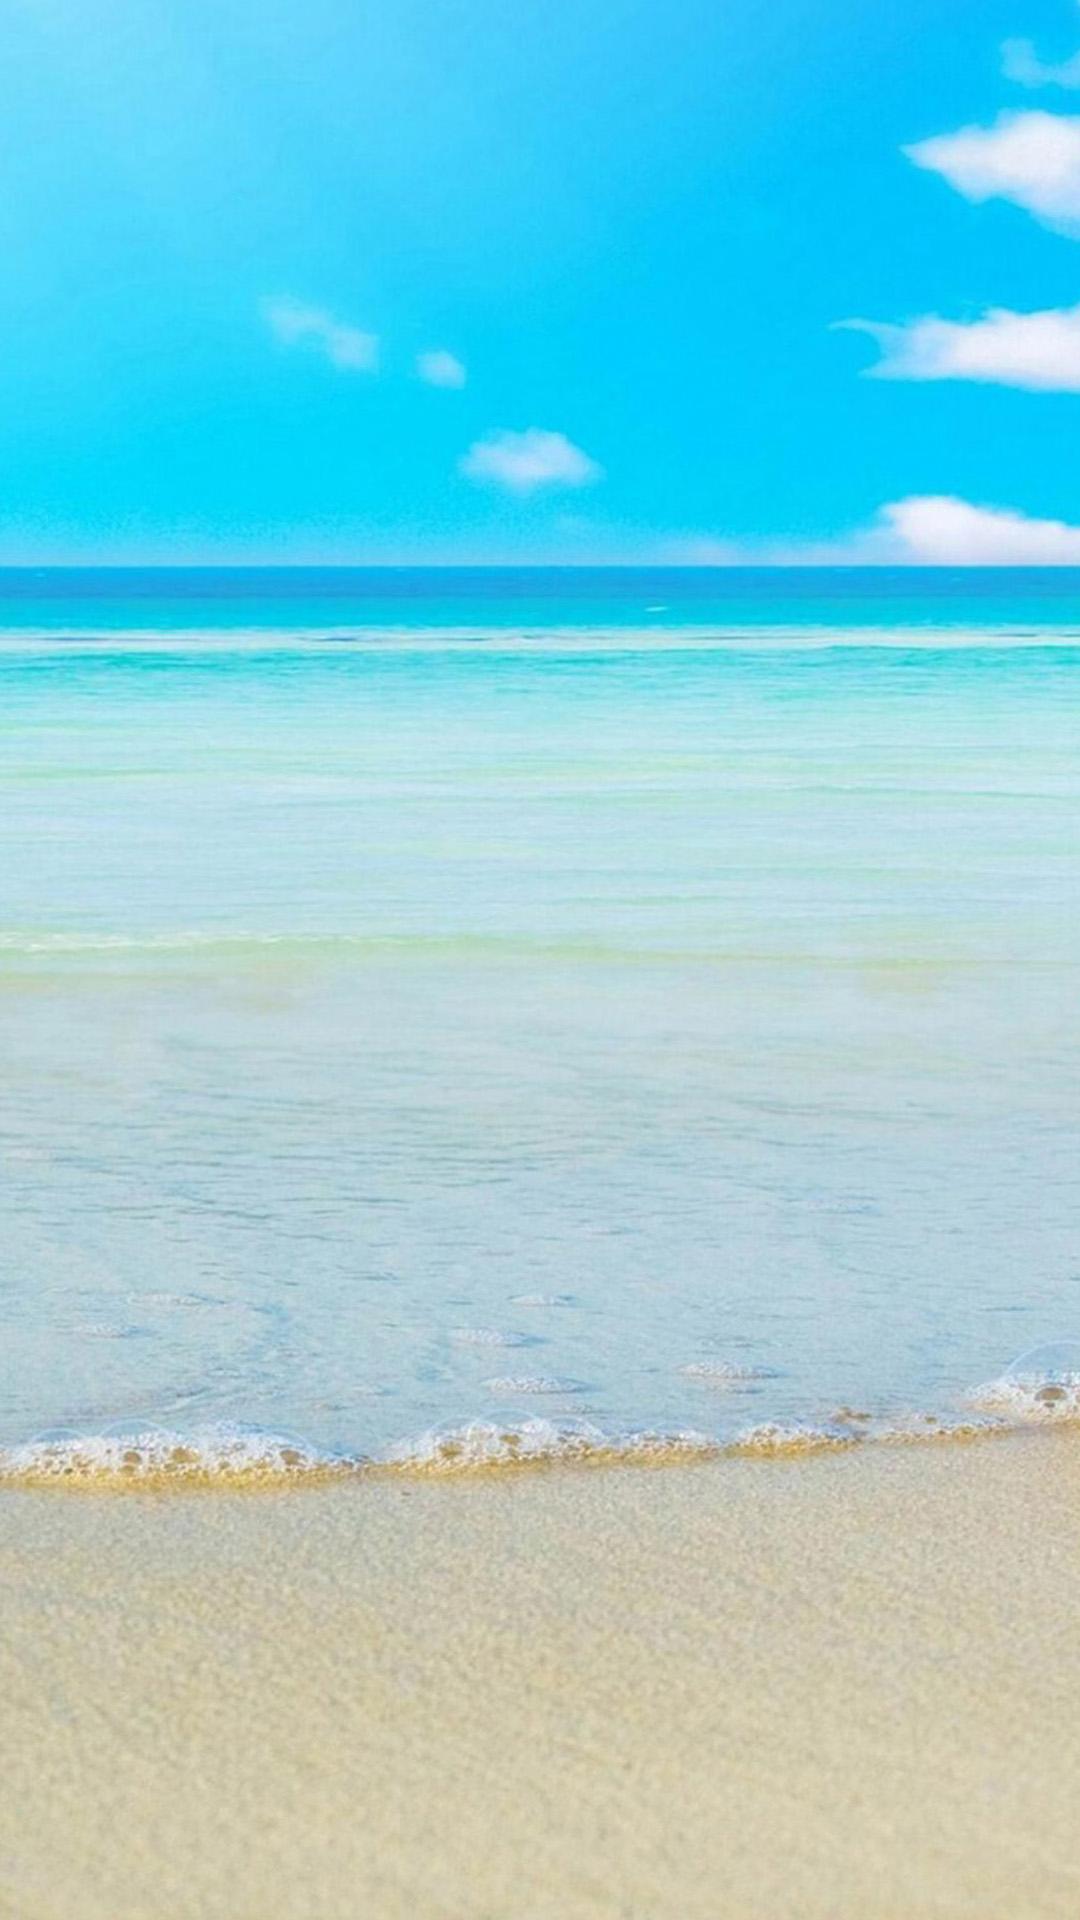 Free Download Calm Ocean Beach Htc One M8 Wallpaper Htc One M8